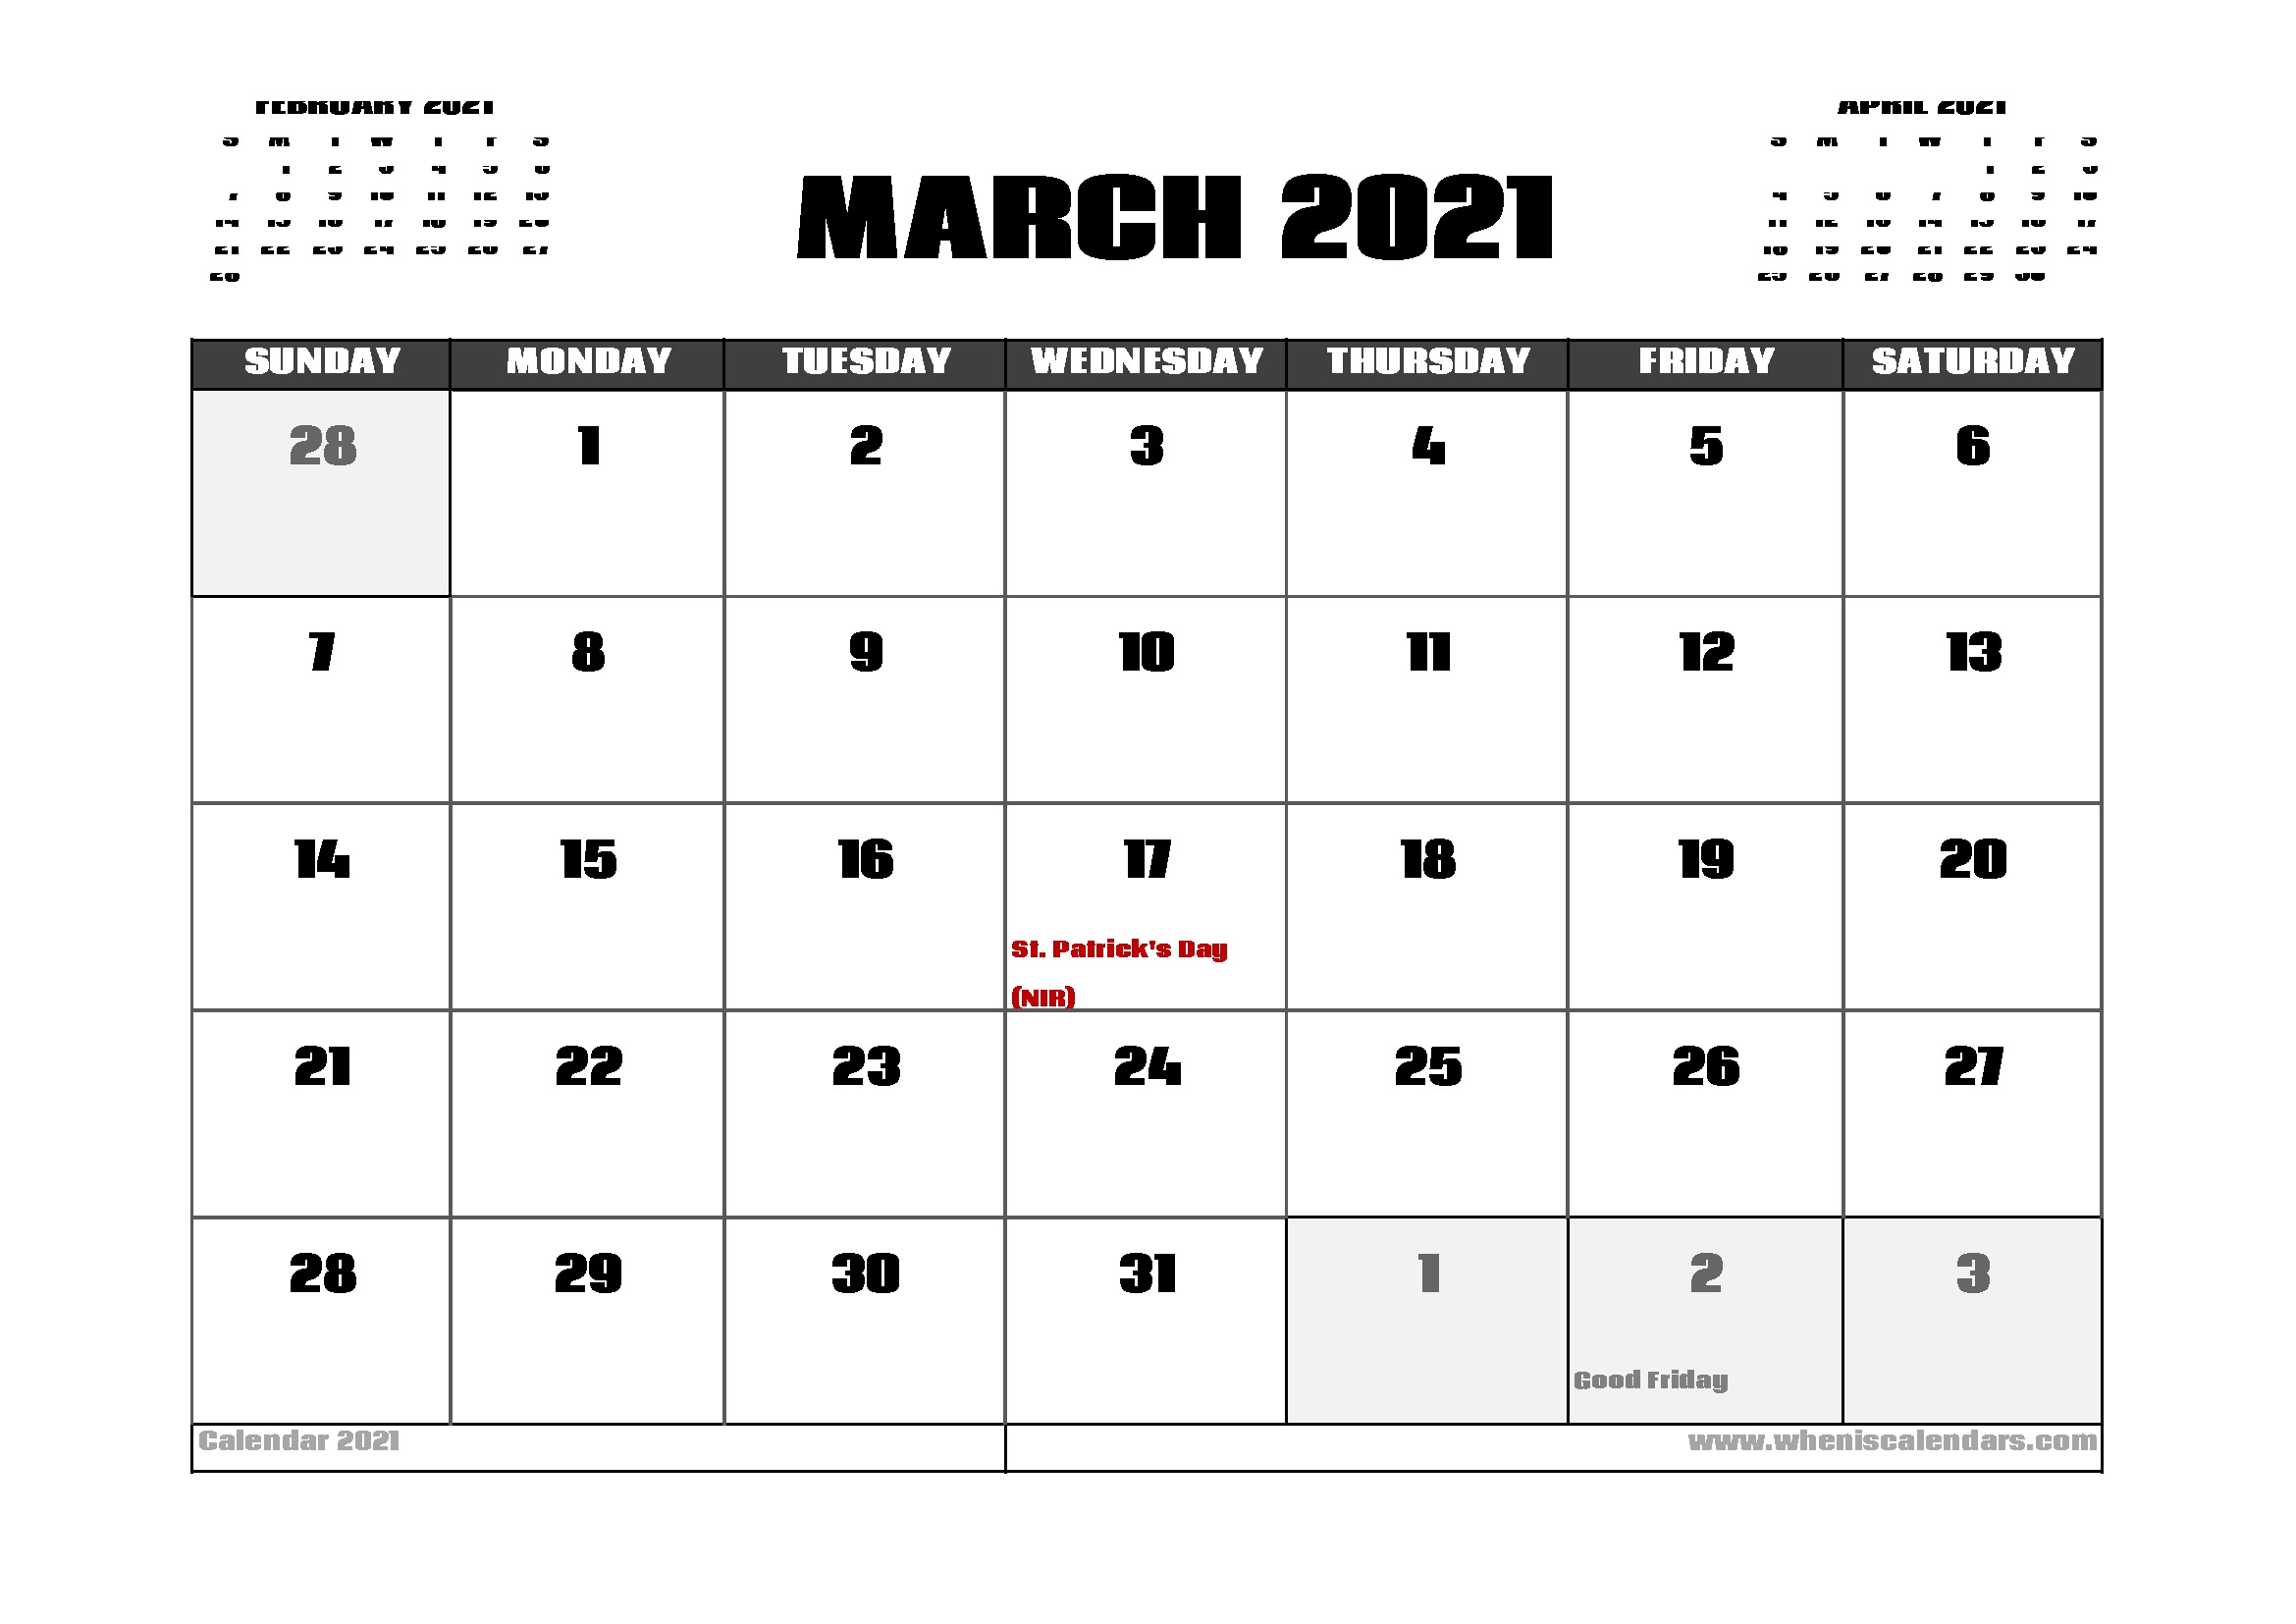 20+ 2021 Public Holidays - Free Download Printable Calendar Templates ️ July 2021 Calendar Canada Printable